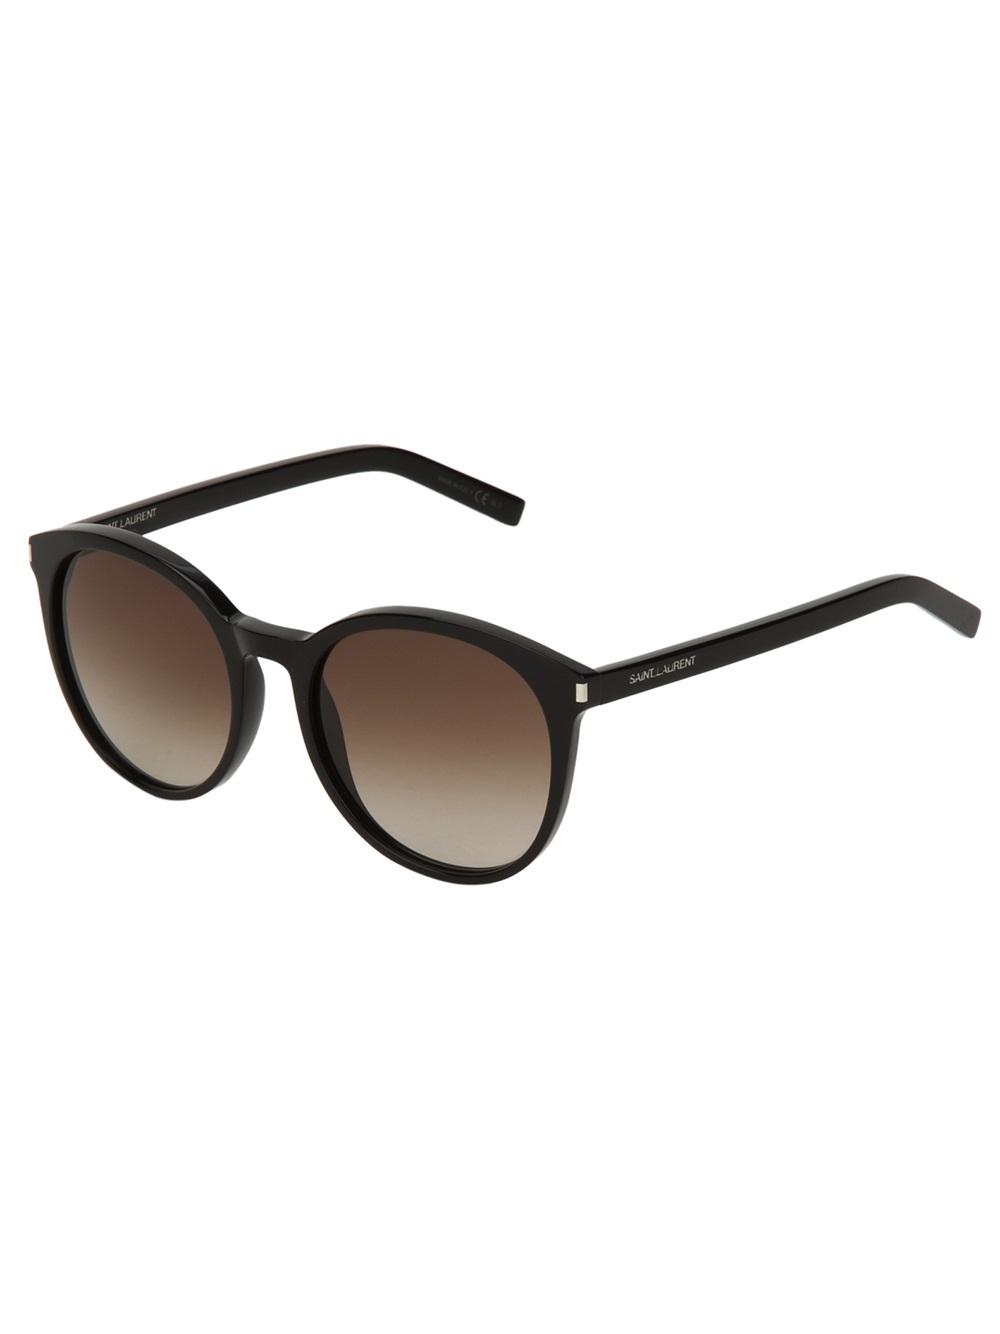 1bb0b2013bcc Saint Laurent Oversize Round Frame Sunglasses in Black - Lyst